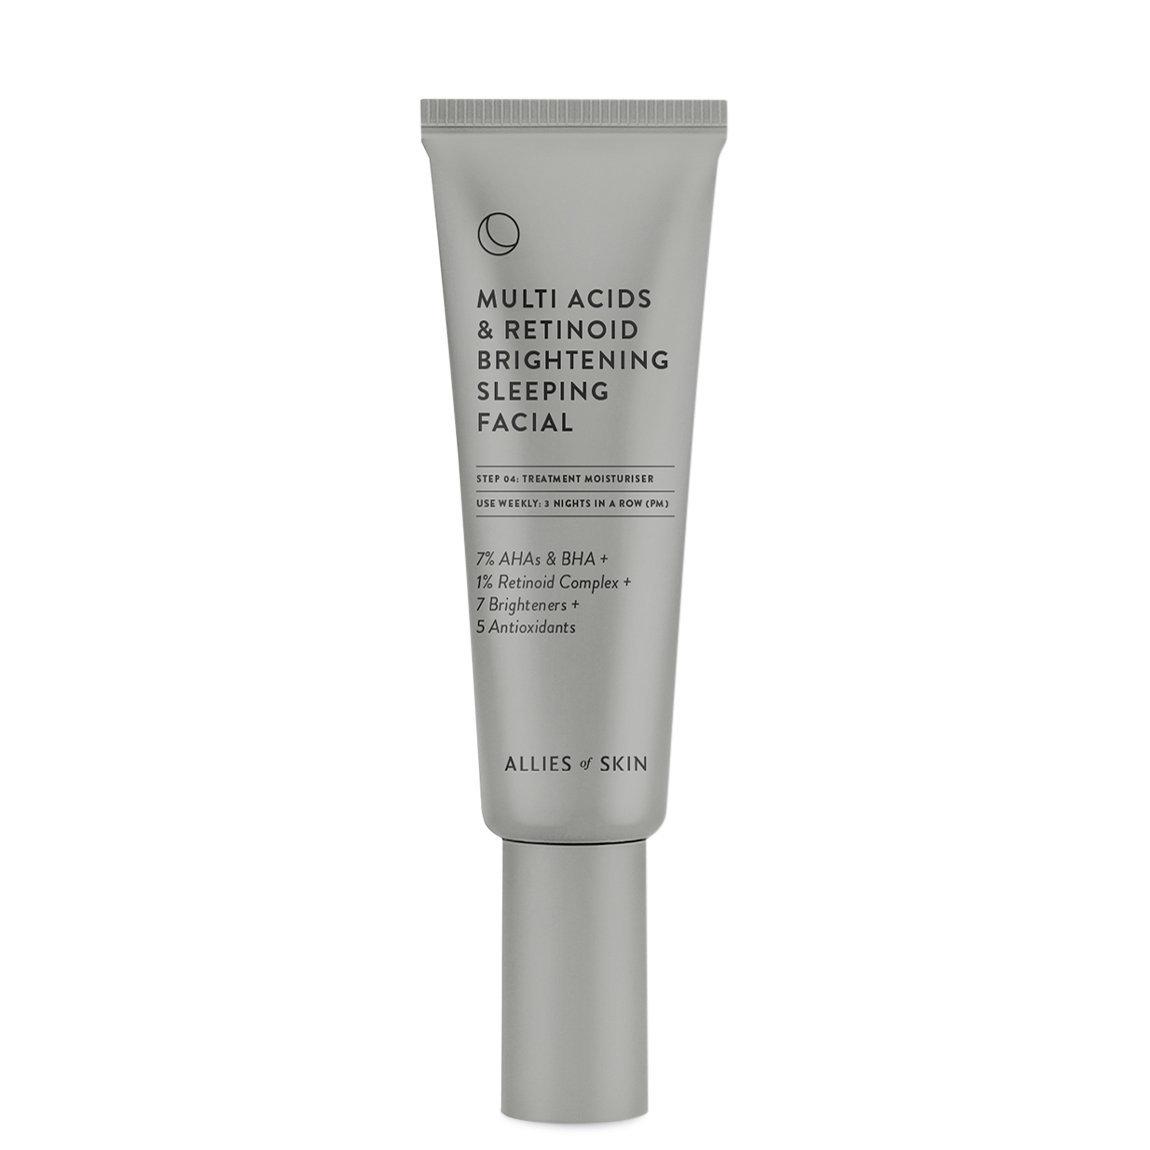 Allies of Skin Multi Acids & Retinoid Brightening Sleeping Facial alternative view 1 - product swatch.